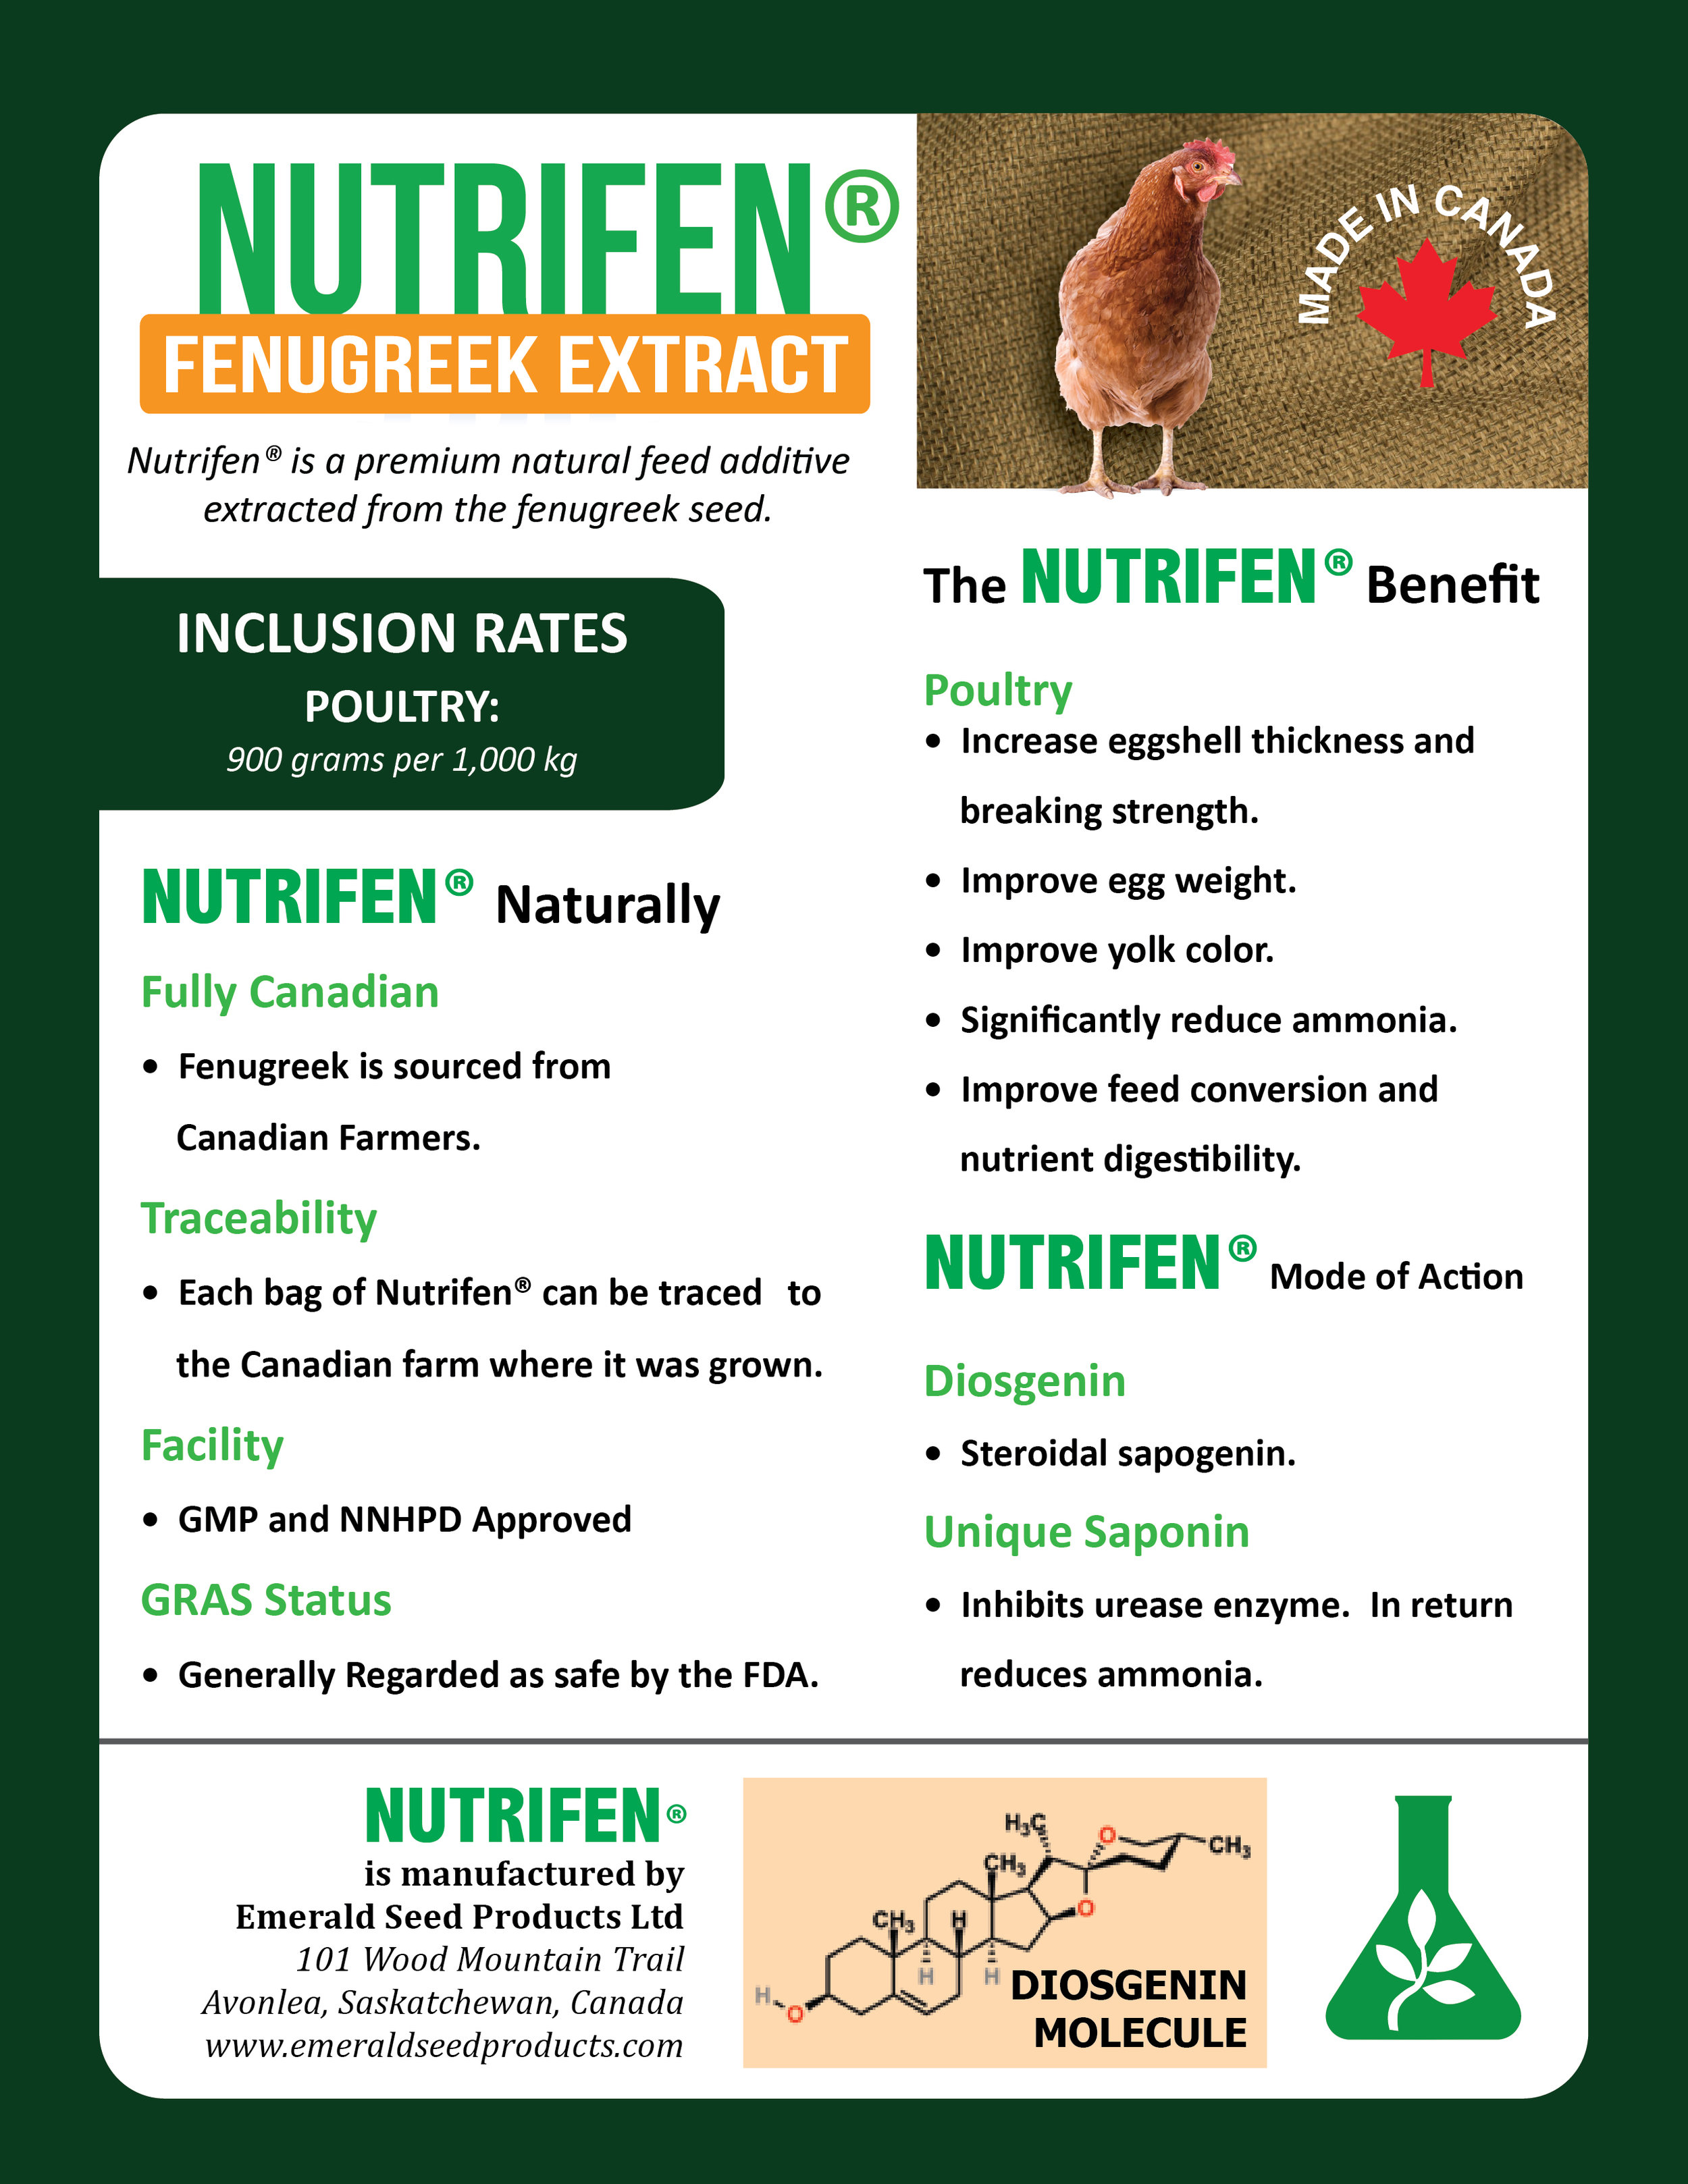 Nutrifen_Pamphlet_Poultry_Feb13_2019_rgb-01.jpg